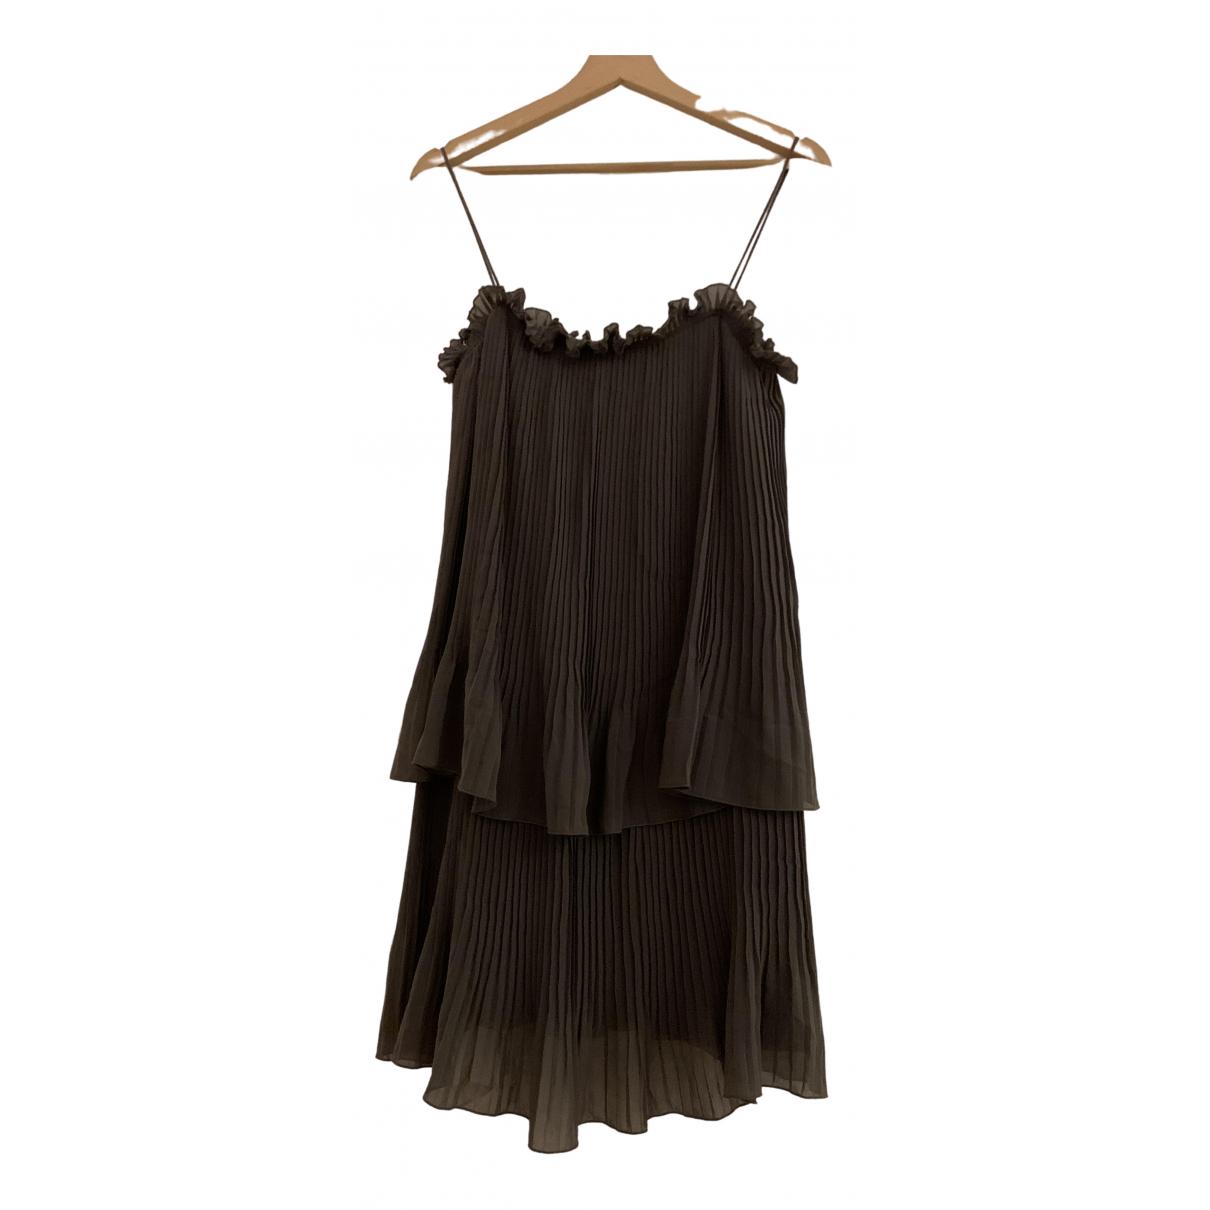 Tara Jarmon \N Anthracite dress for Women 36 FR